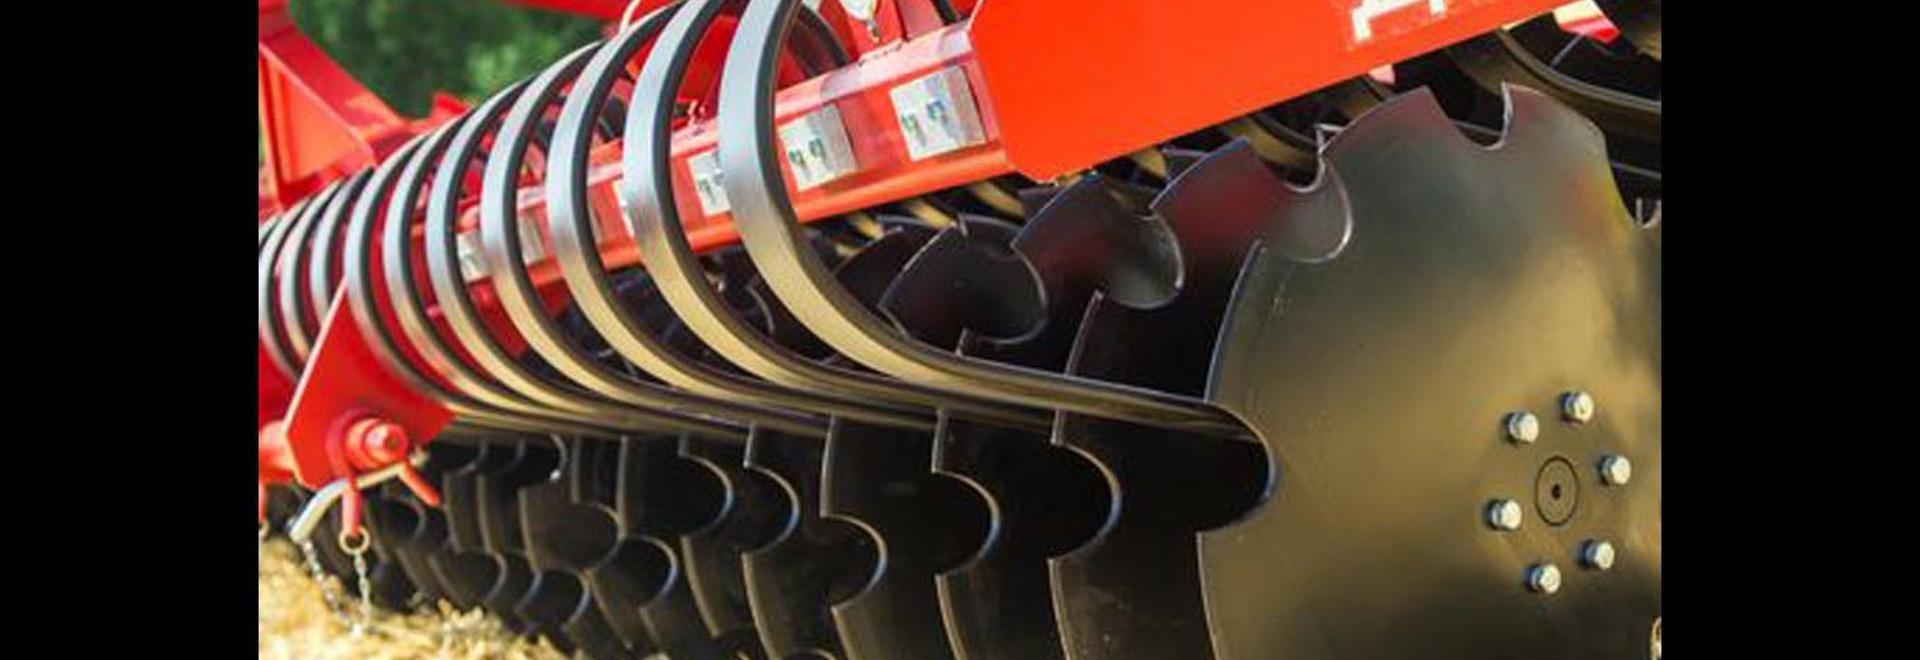 LOZOVA MACHINERY develops new disc harrow